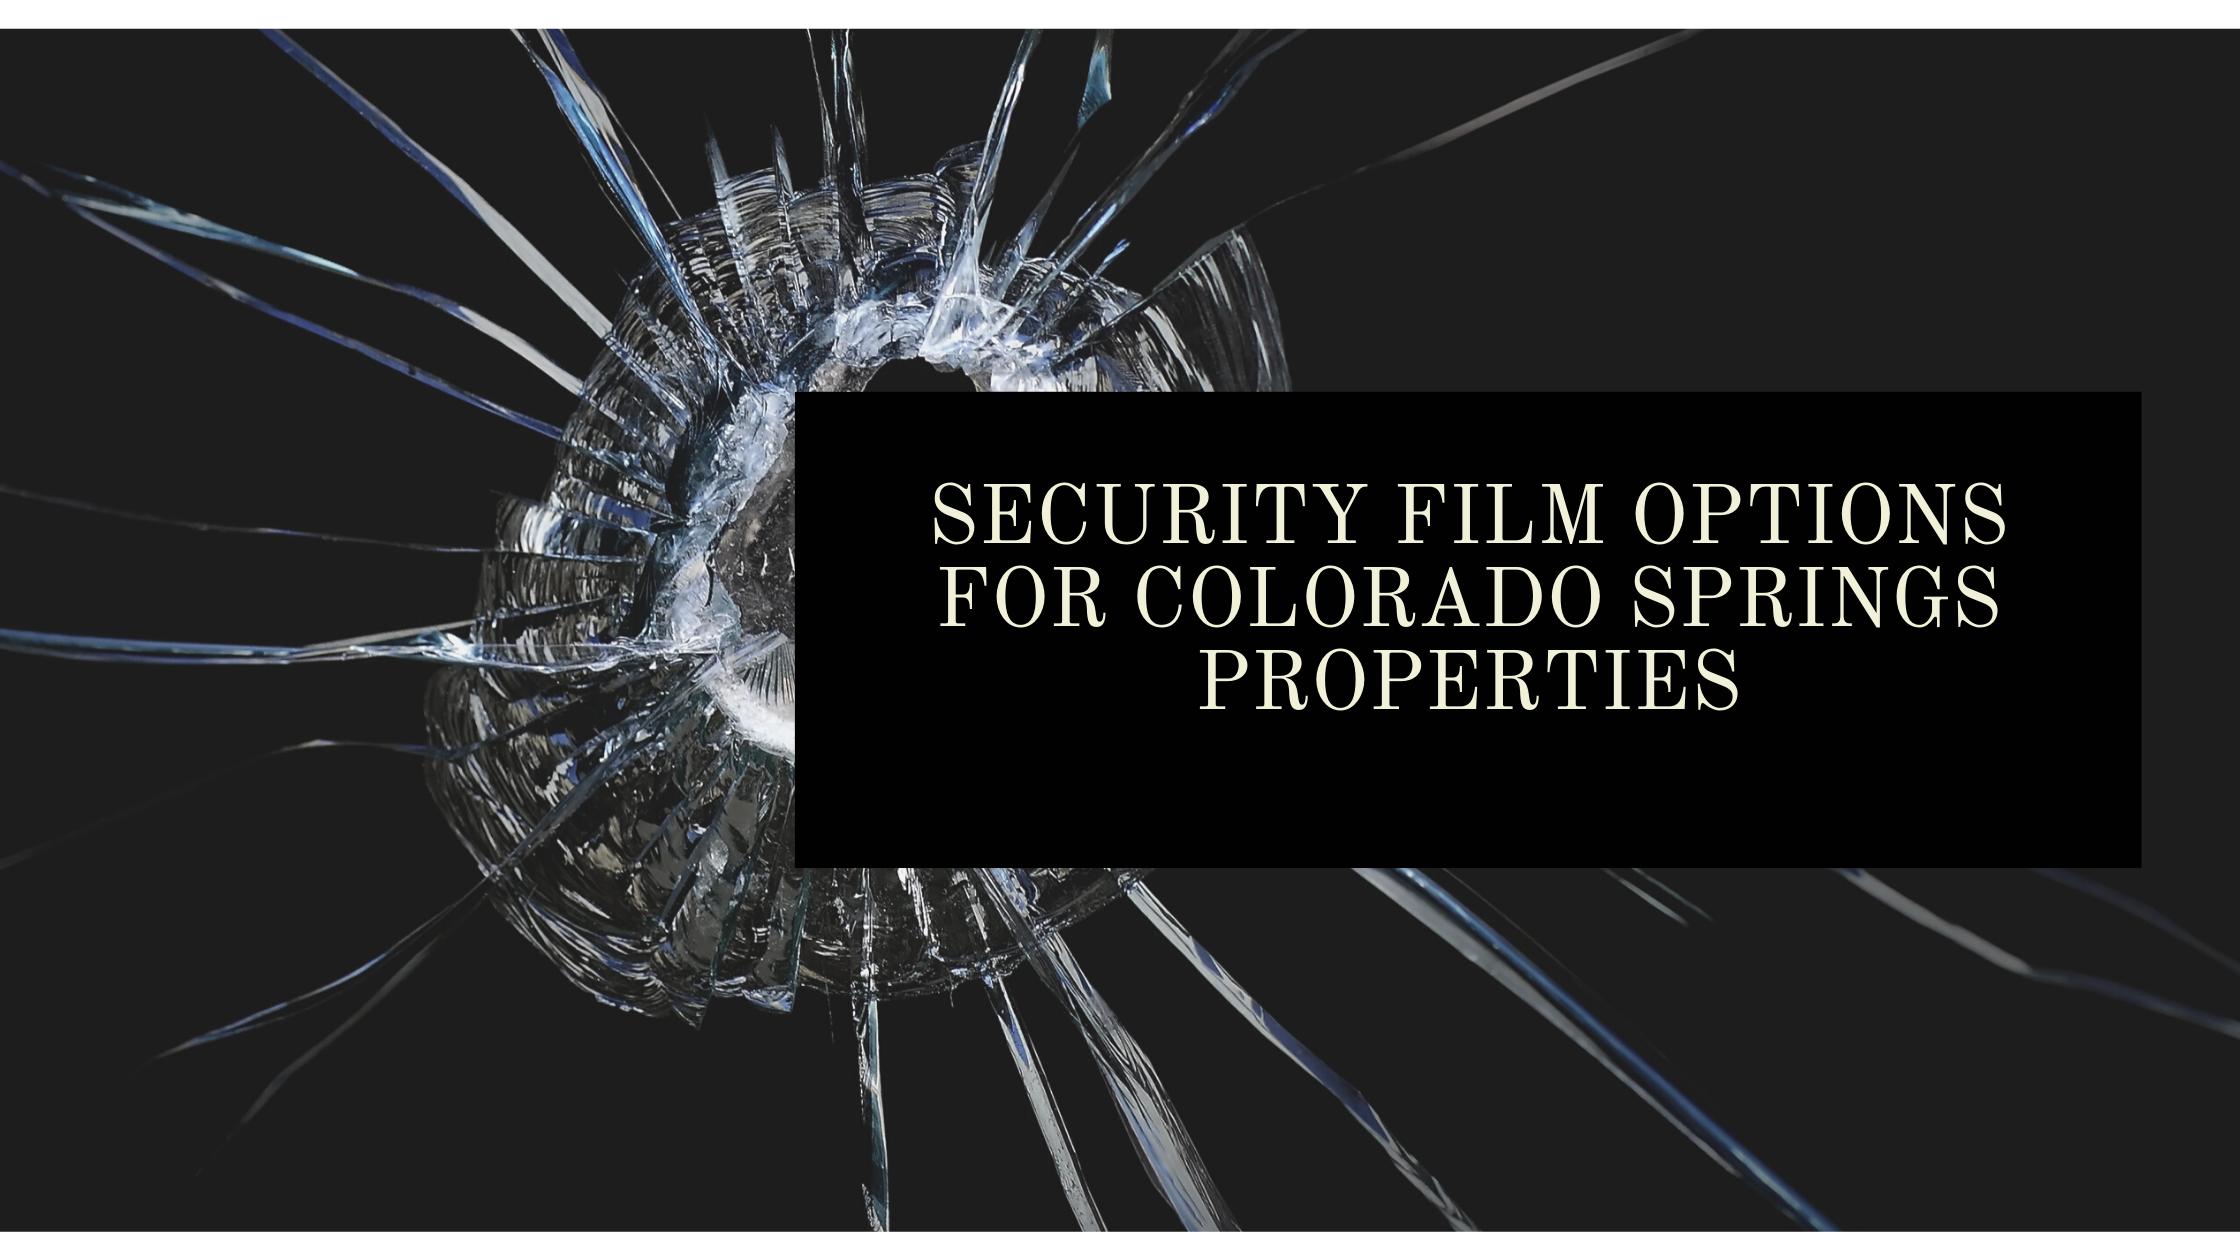 Security Film Options for Colorado Springs Properties